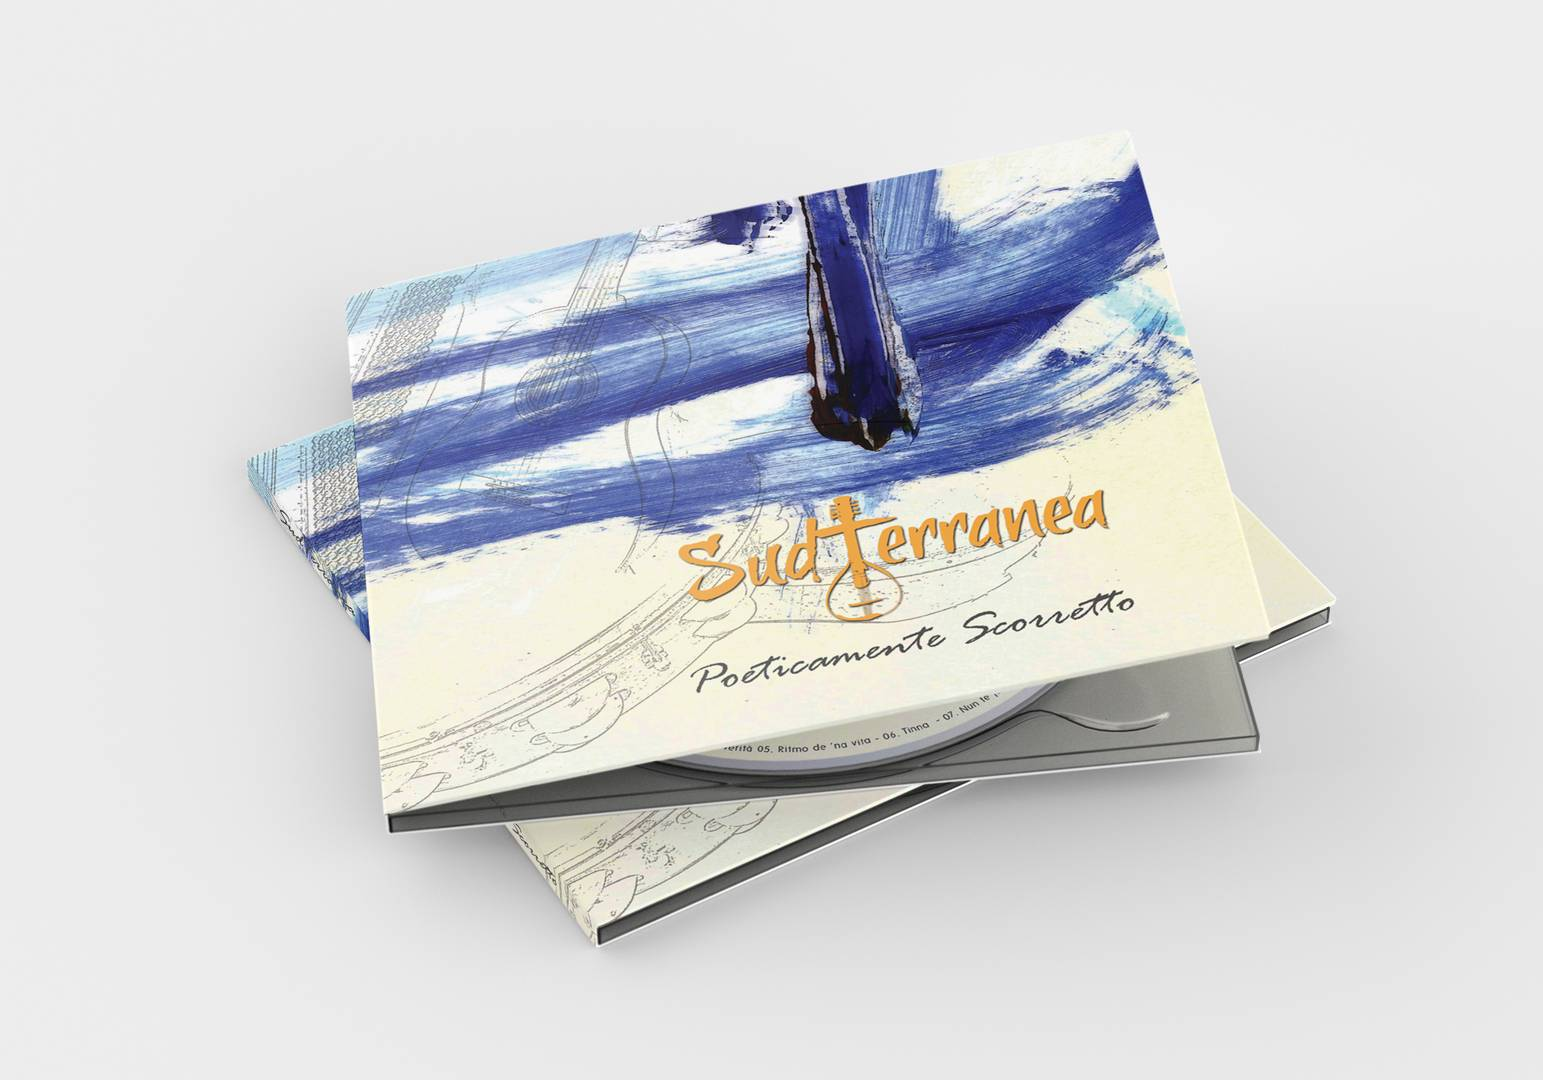 RENDER-2album sudterranea poeticamente scorretto.jpg